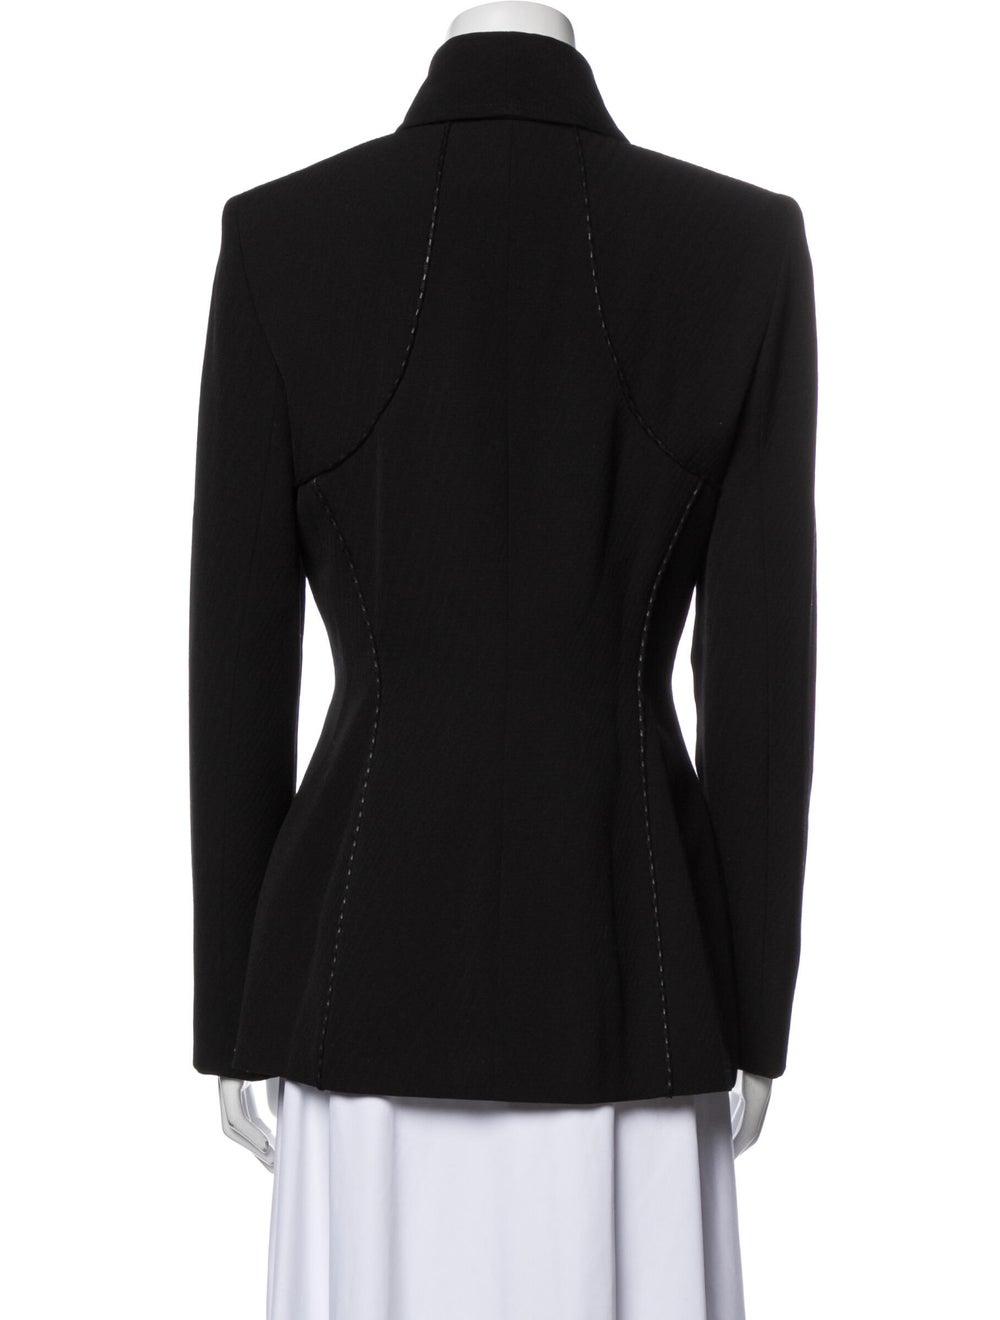 Gianni Versace Wool Blazer Wool - image 3